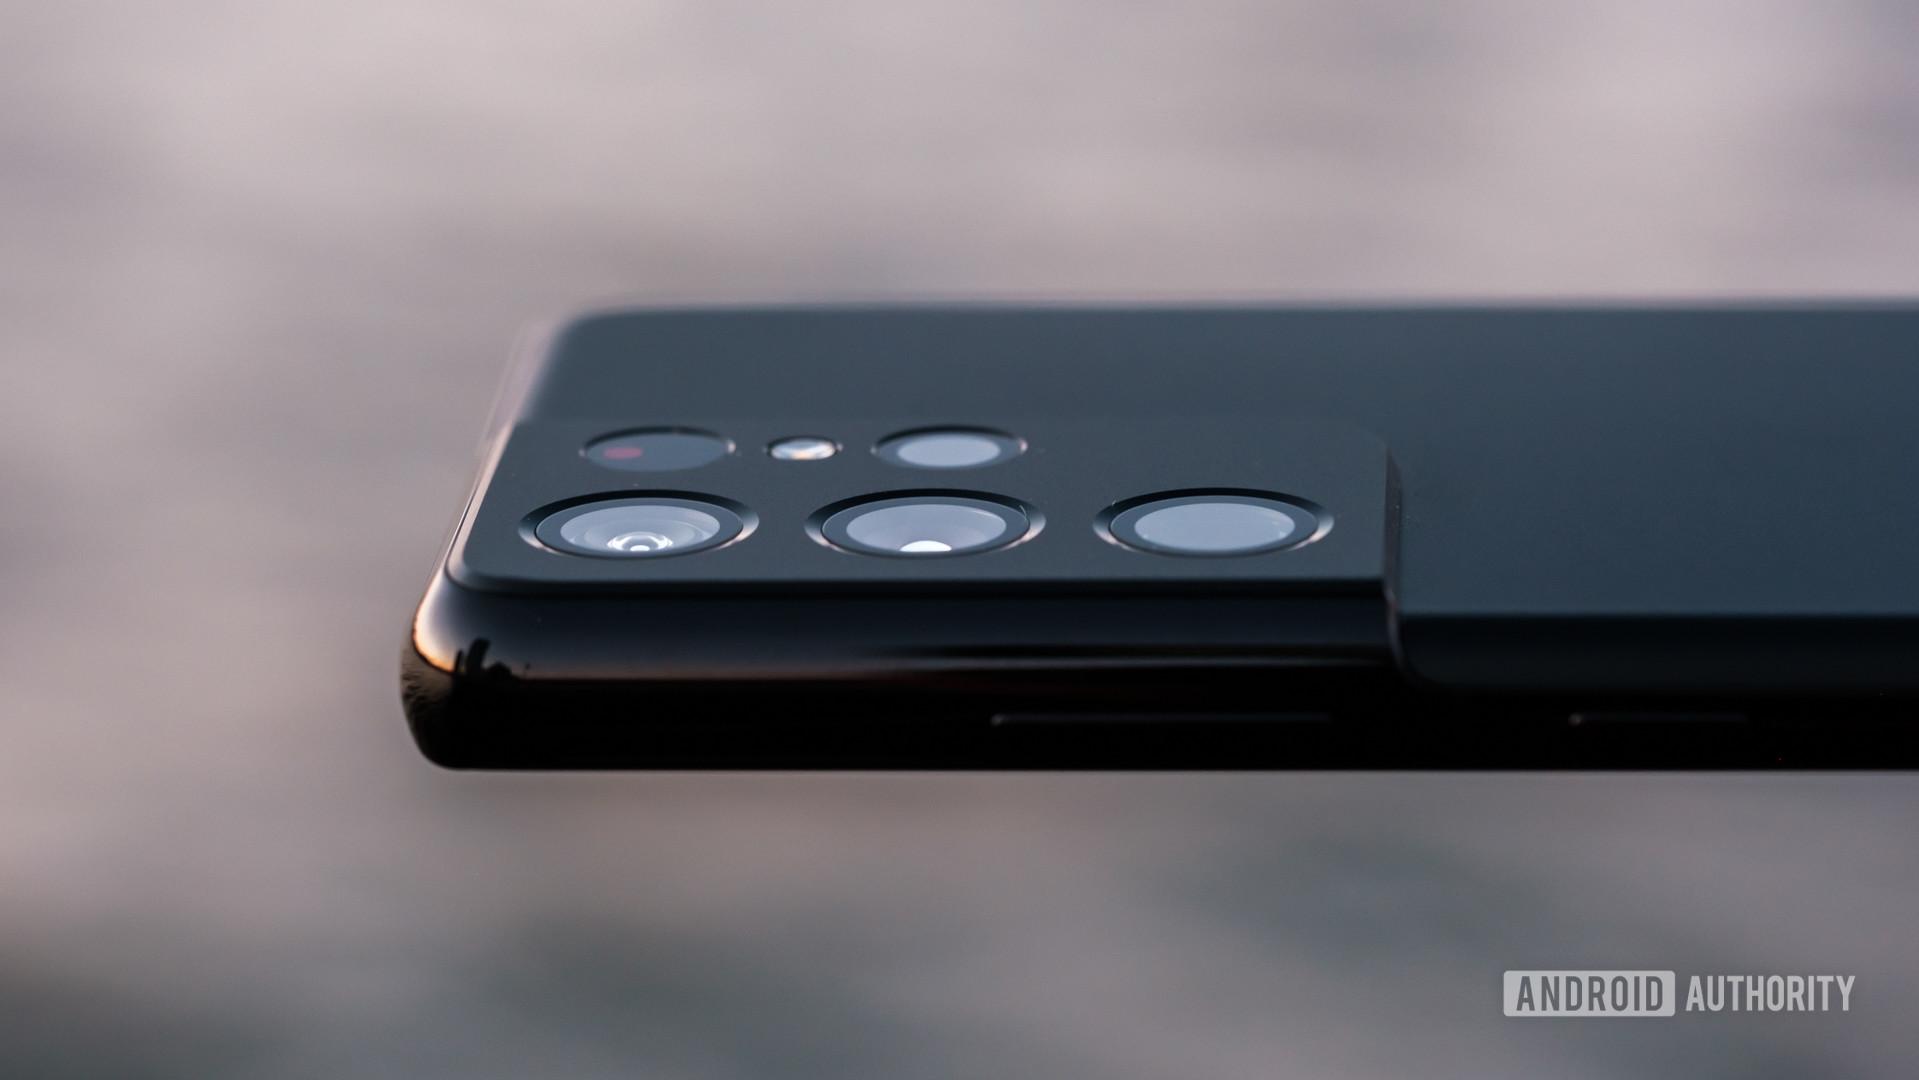 Samsung Galaxy S21 Ultra camera bump side view